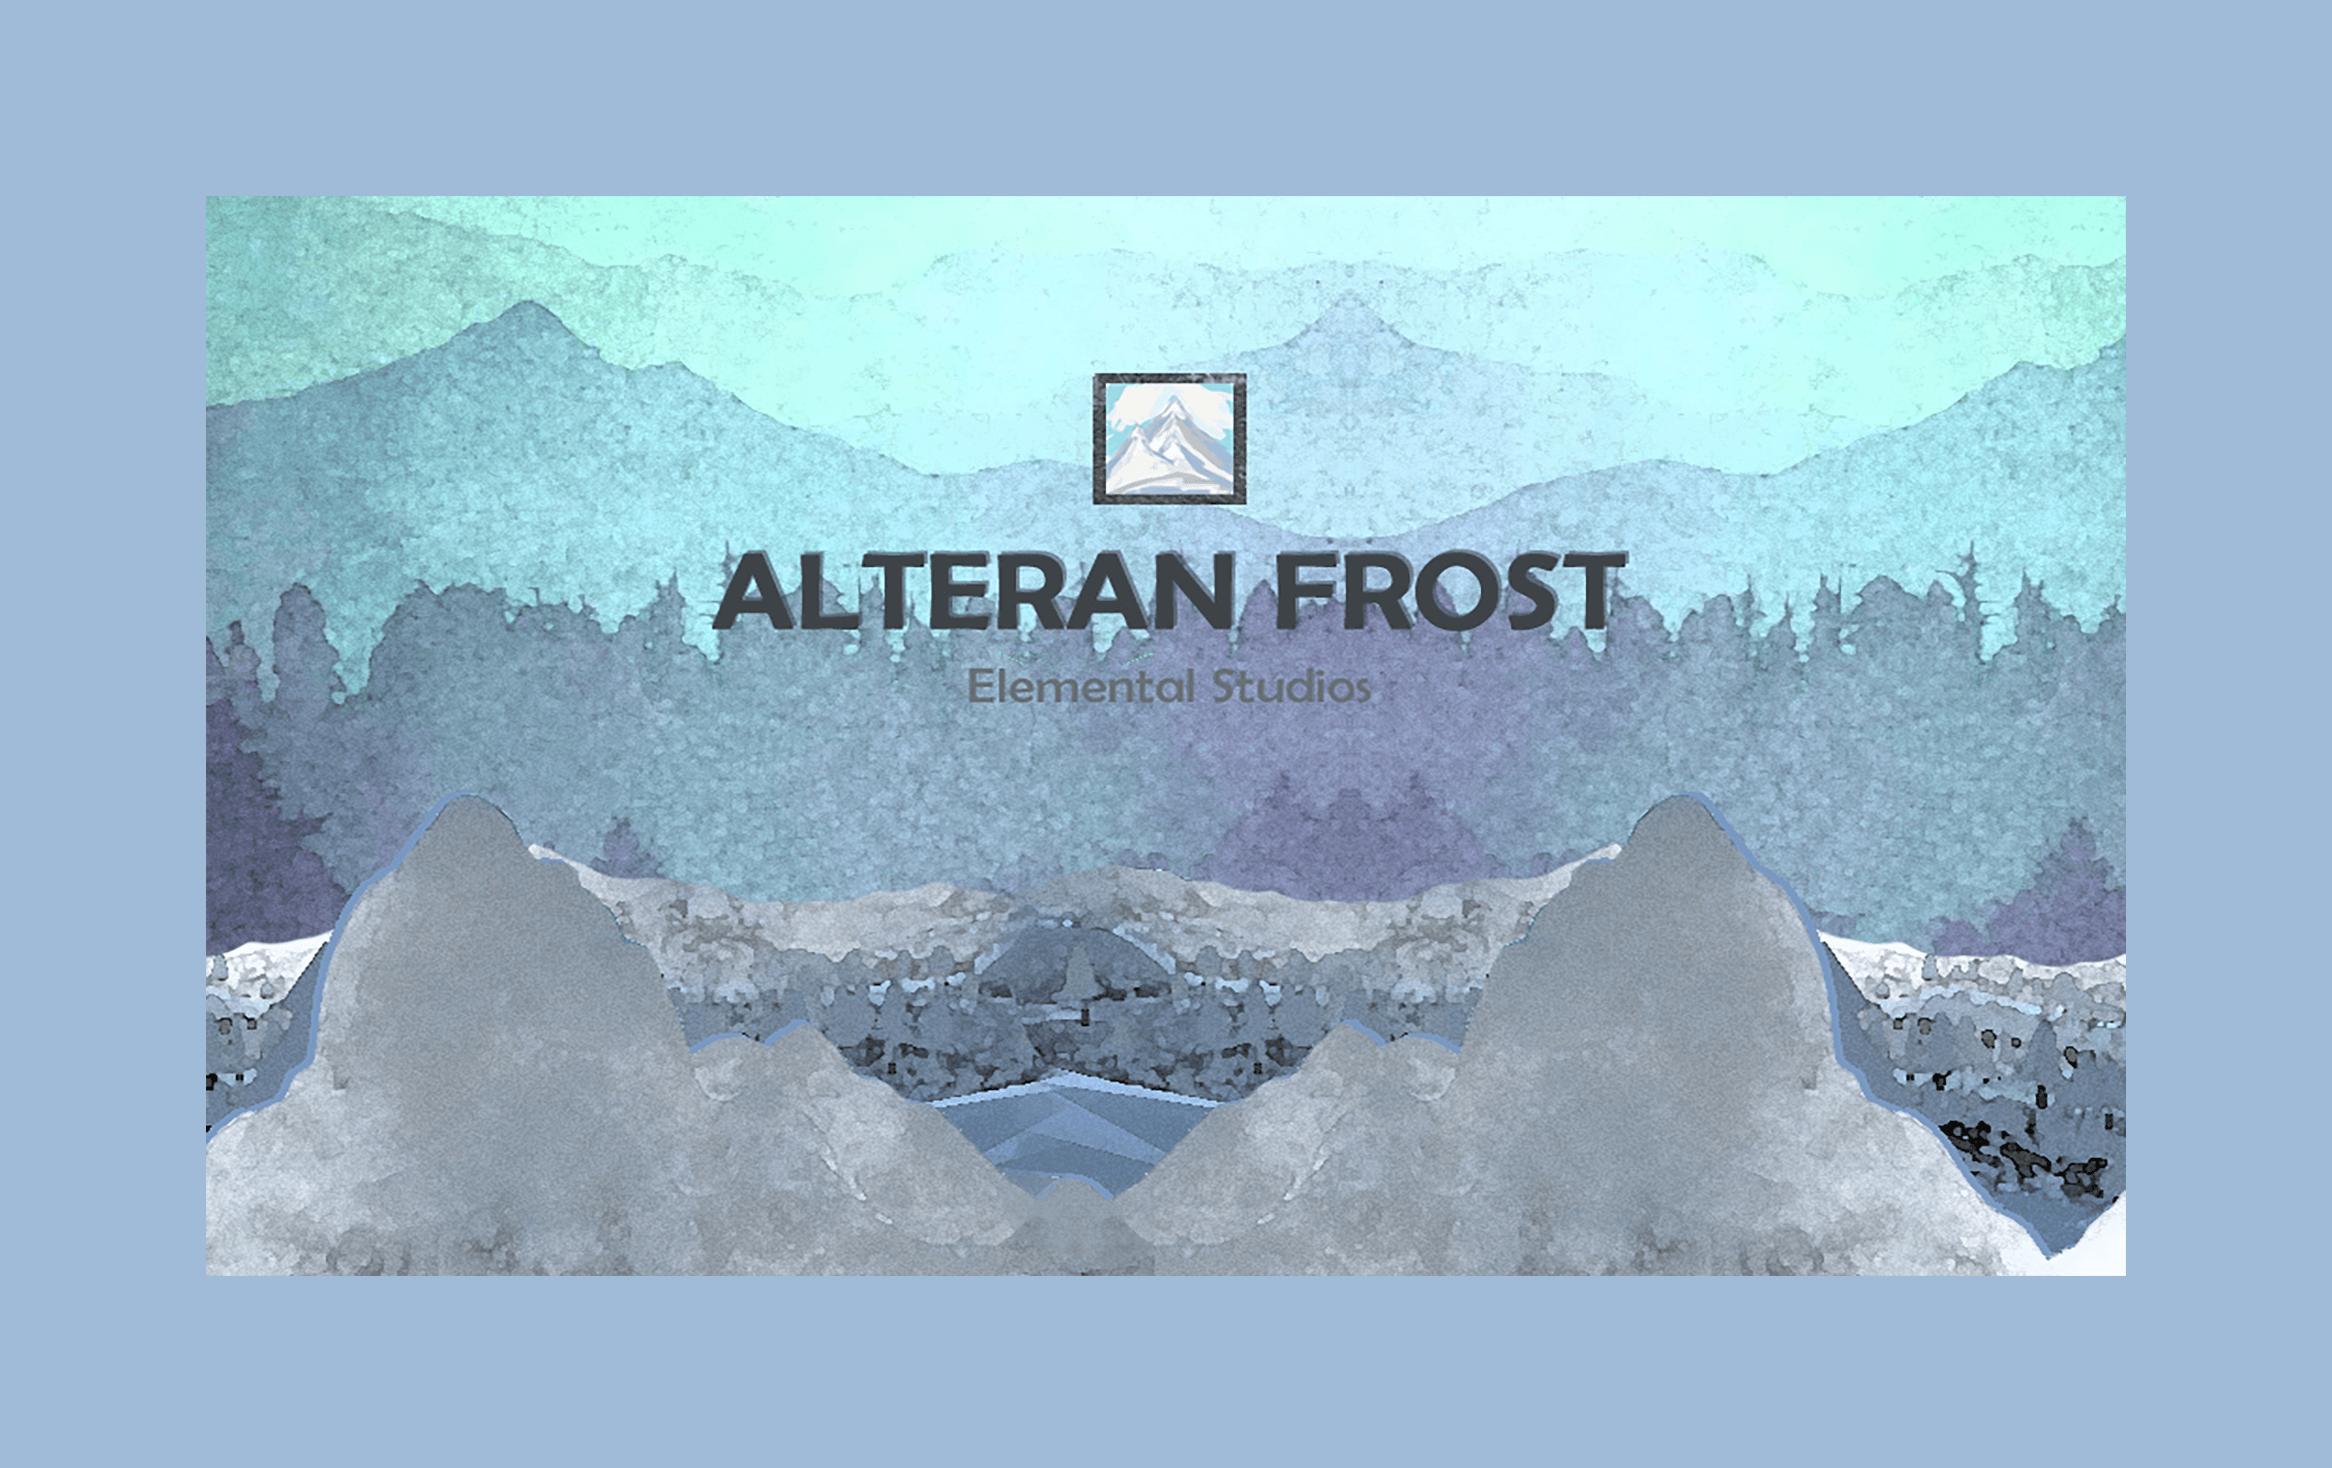 Alteran Frost